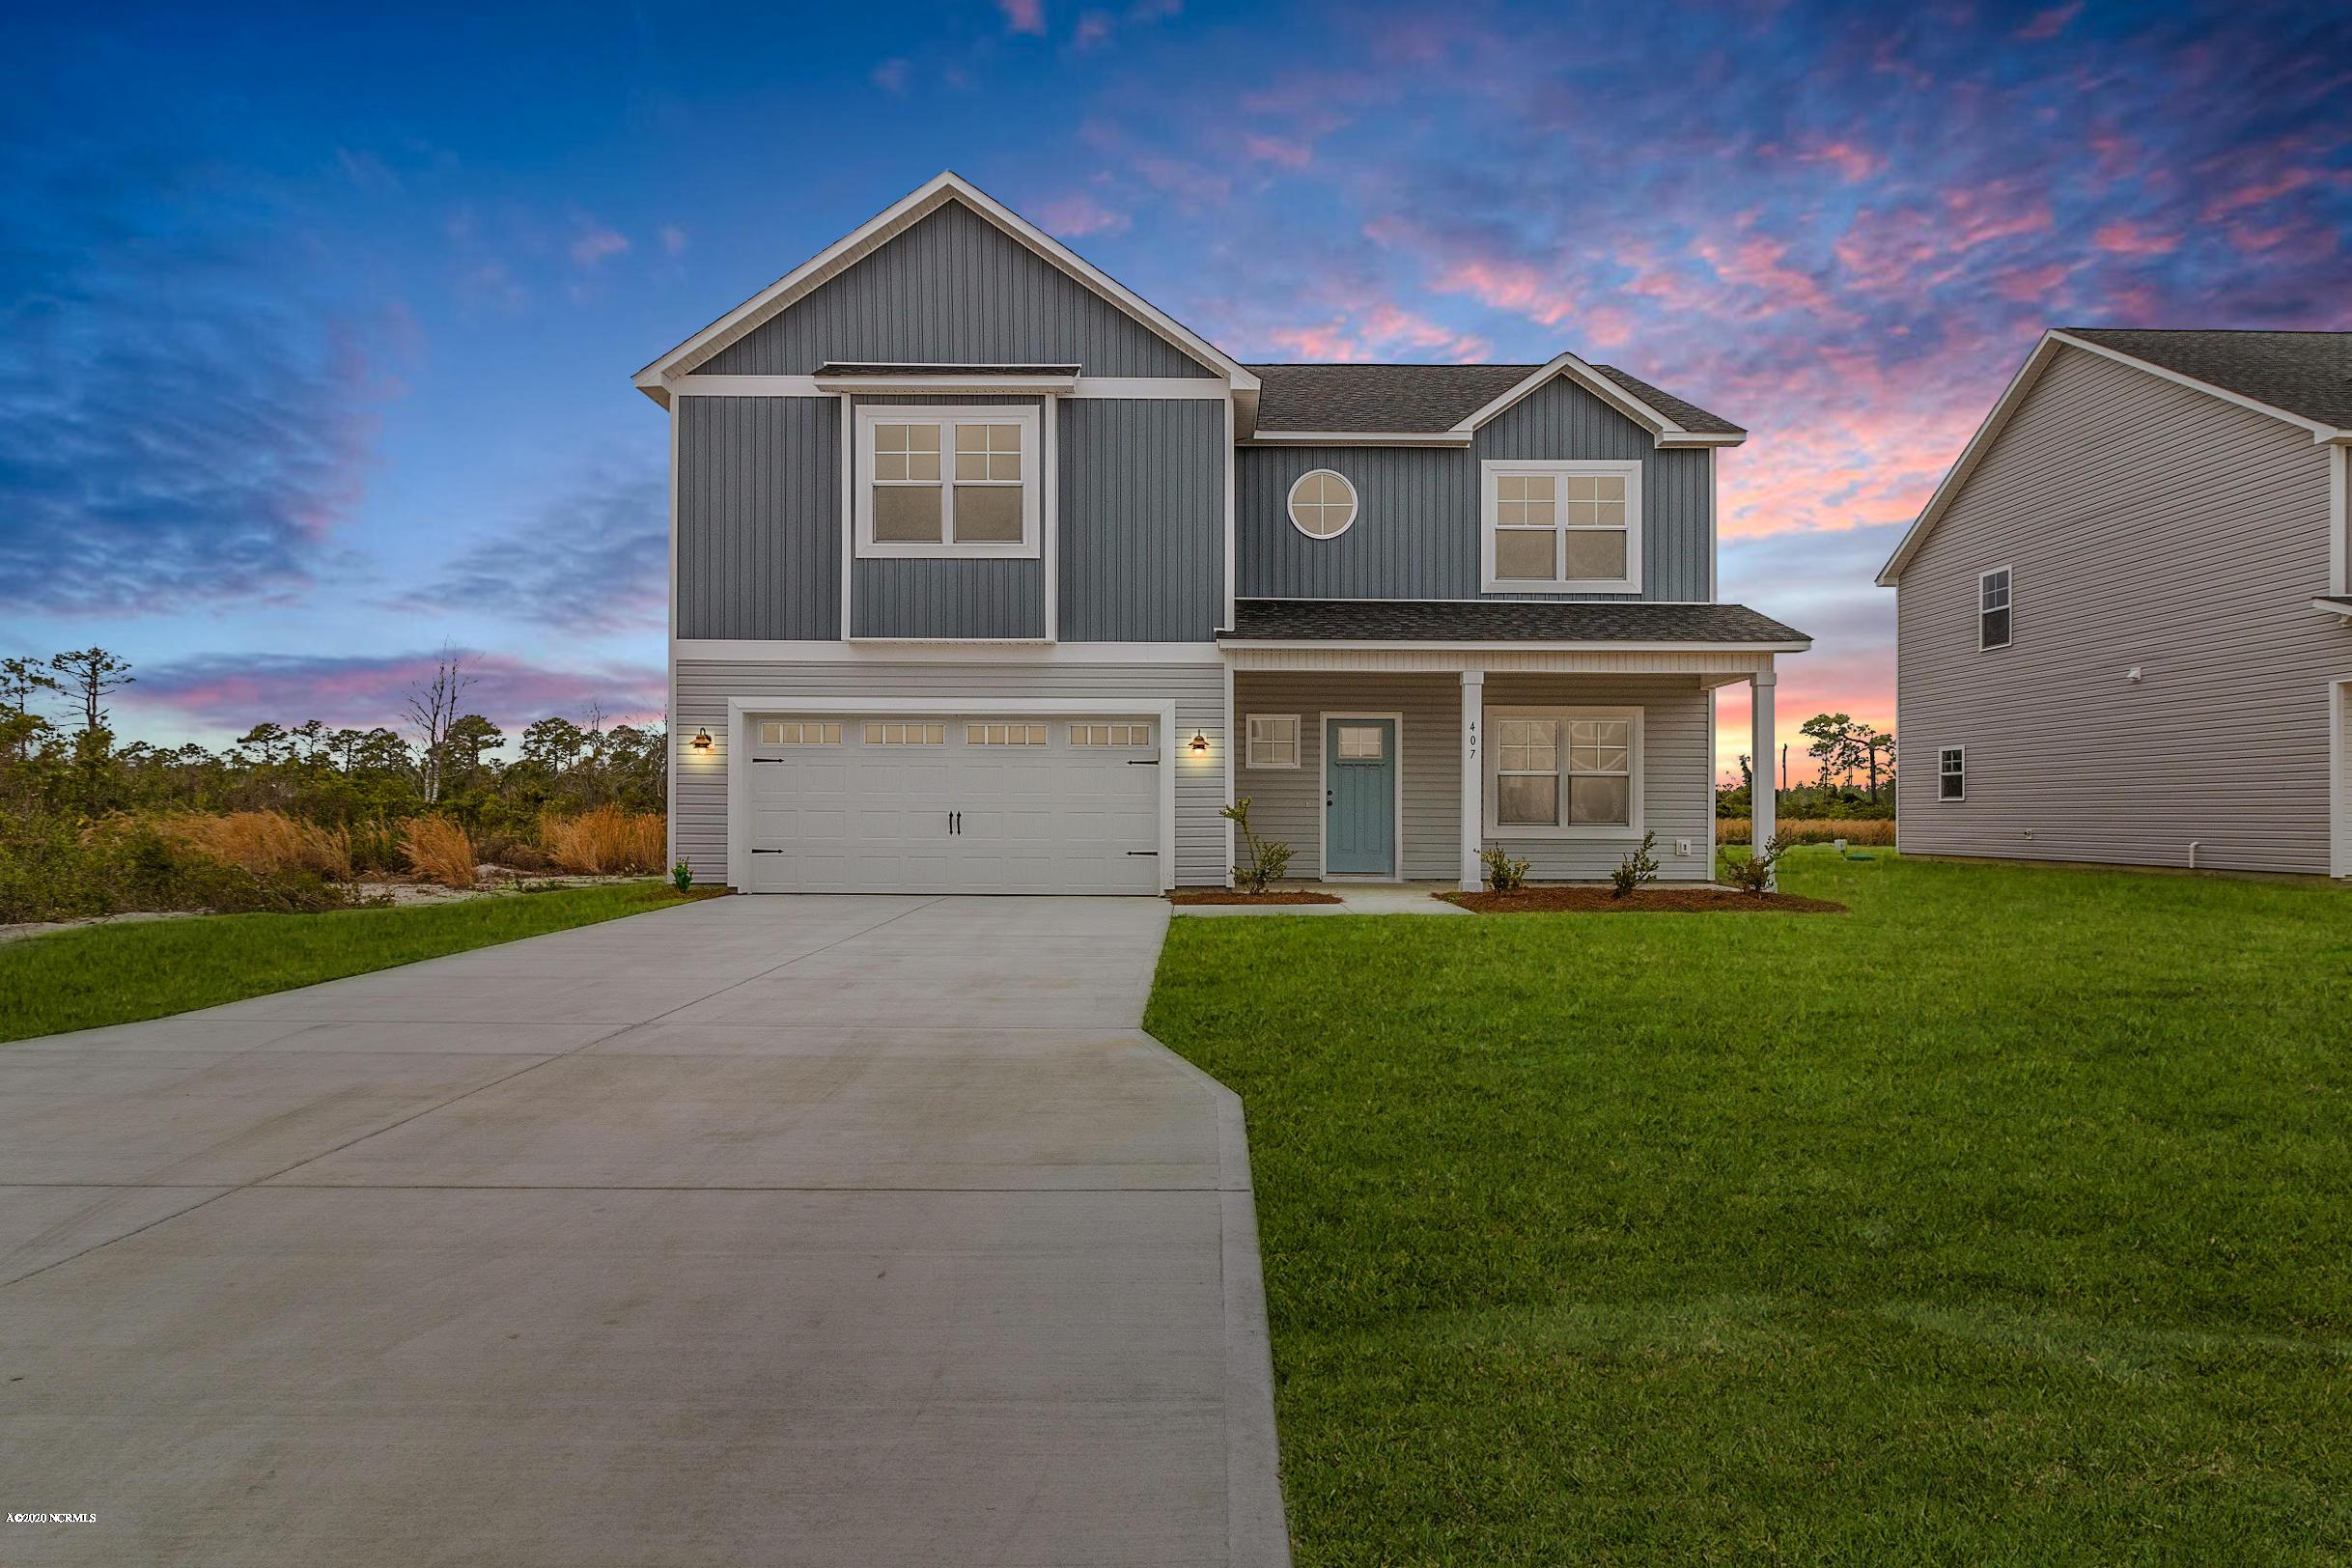 407 Elgin Road, Hubert, North Carolina 28539, 3 Bedrooms Bedrooms, ,2 BathroomsBathrooms,Residential,For Sale,Elgin,100158662